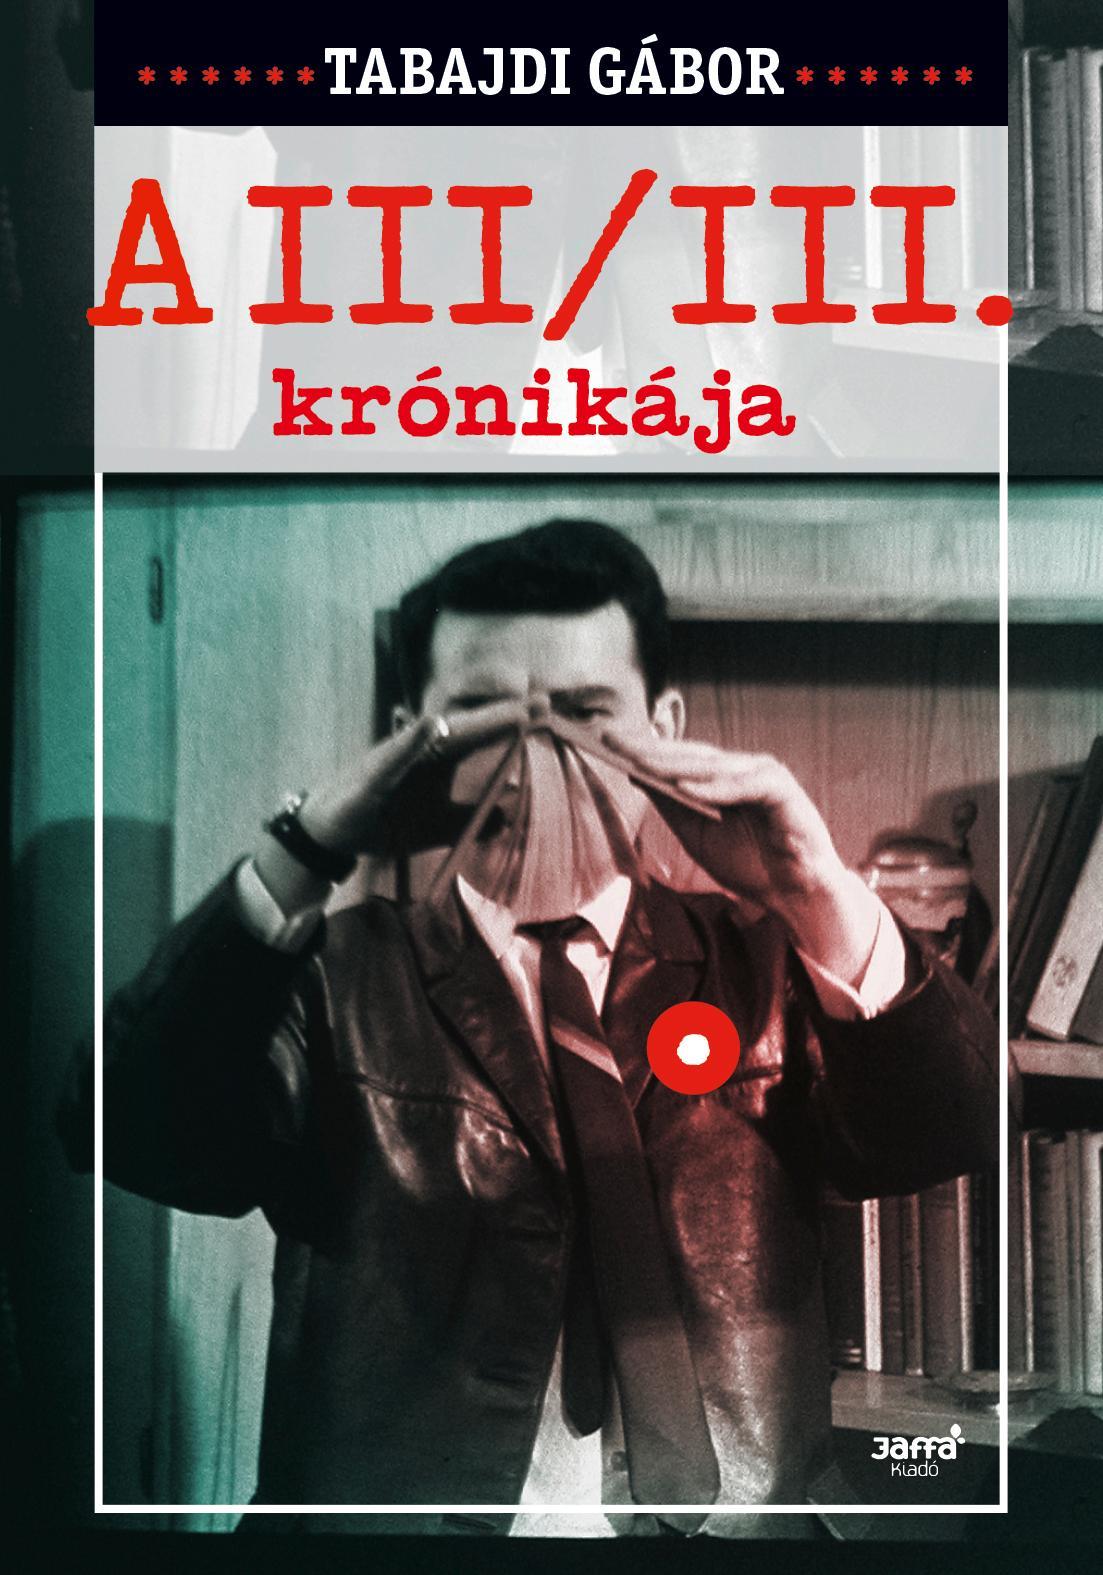 A III/III KRÓNIKÁJA